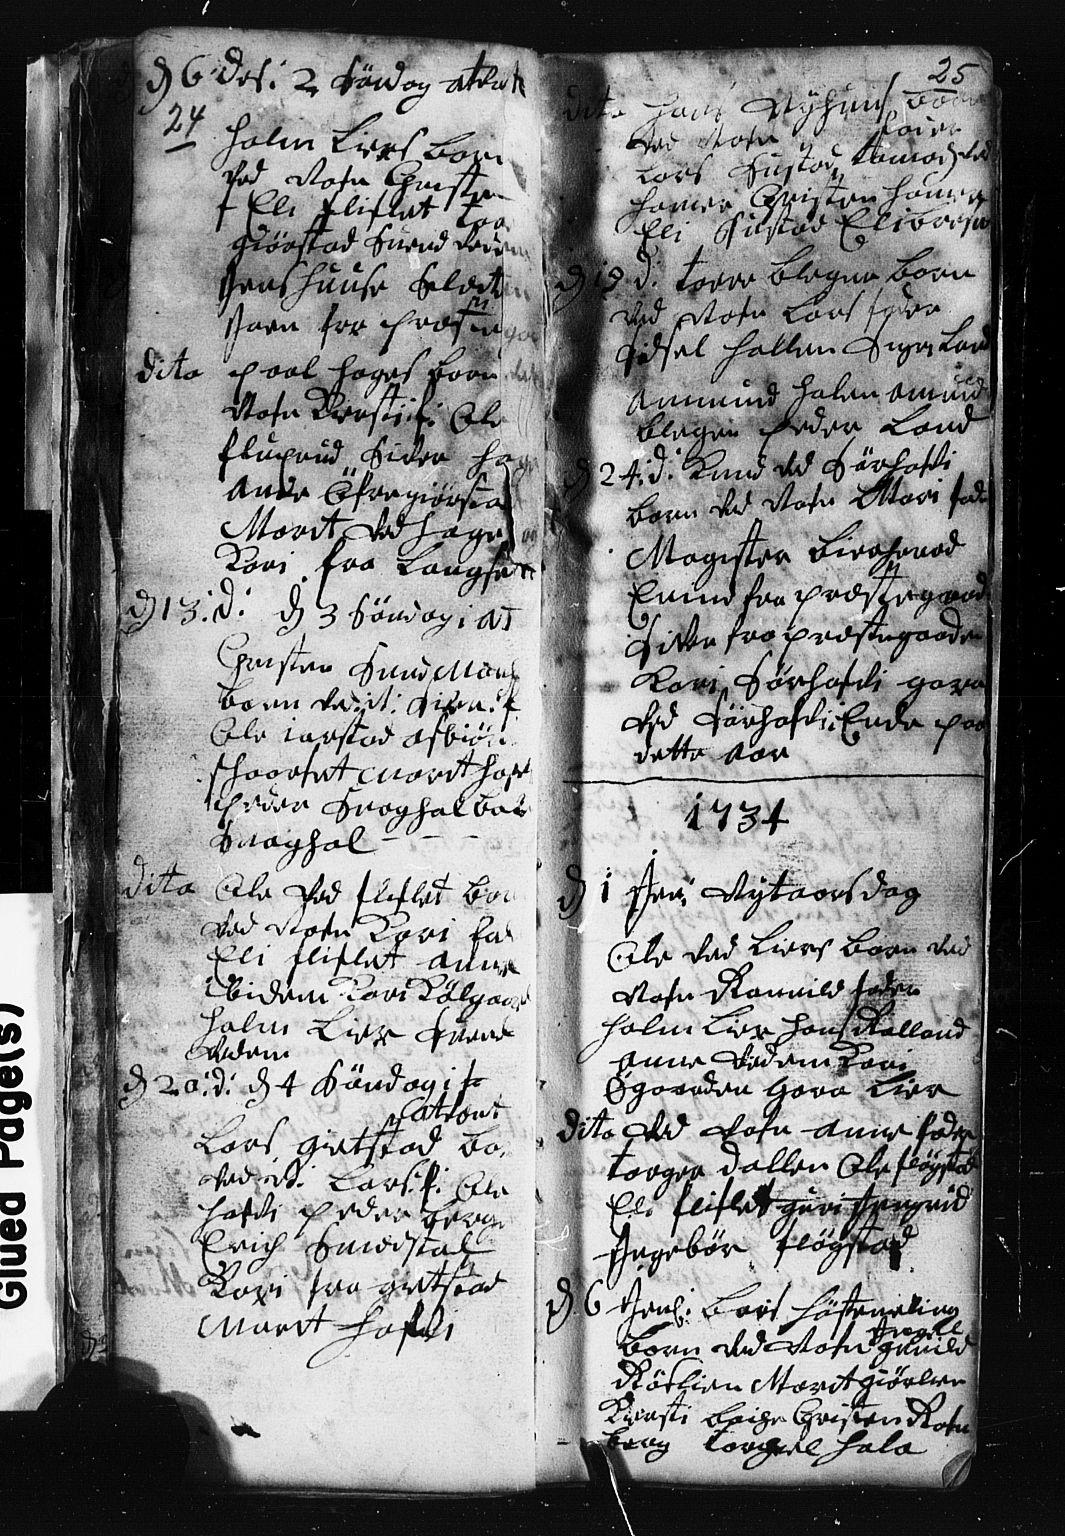 SAH, Fåberg prestekontor, Klokkerbok nr. 1, 1727-1767, s. 24-25